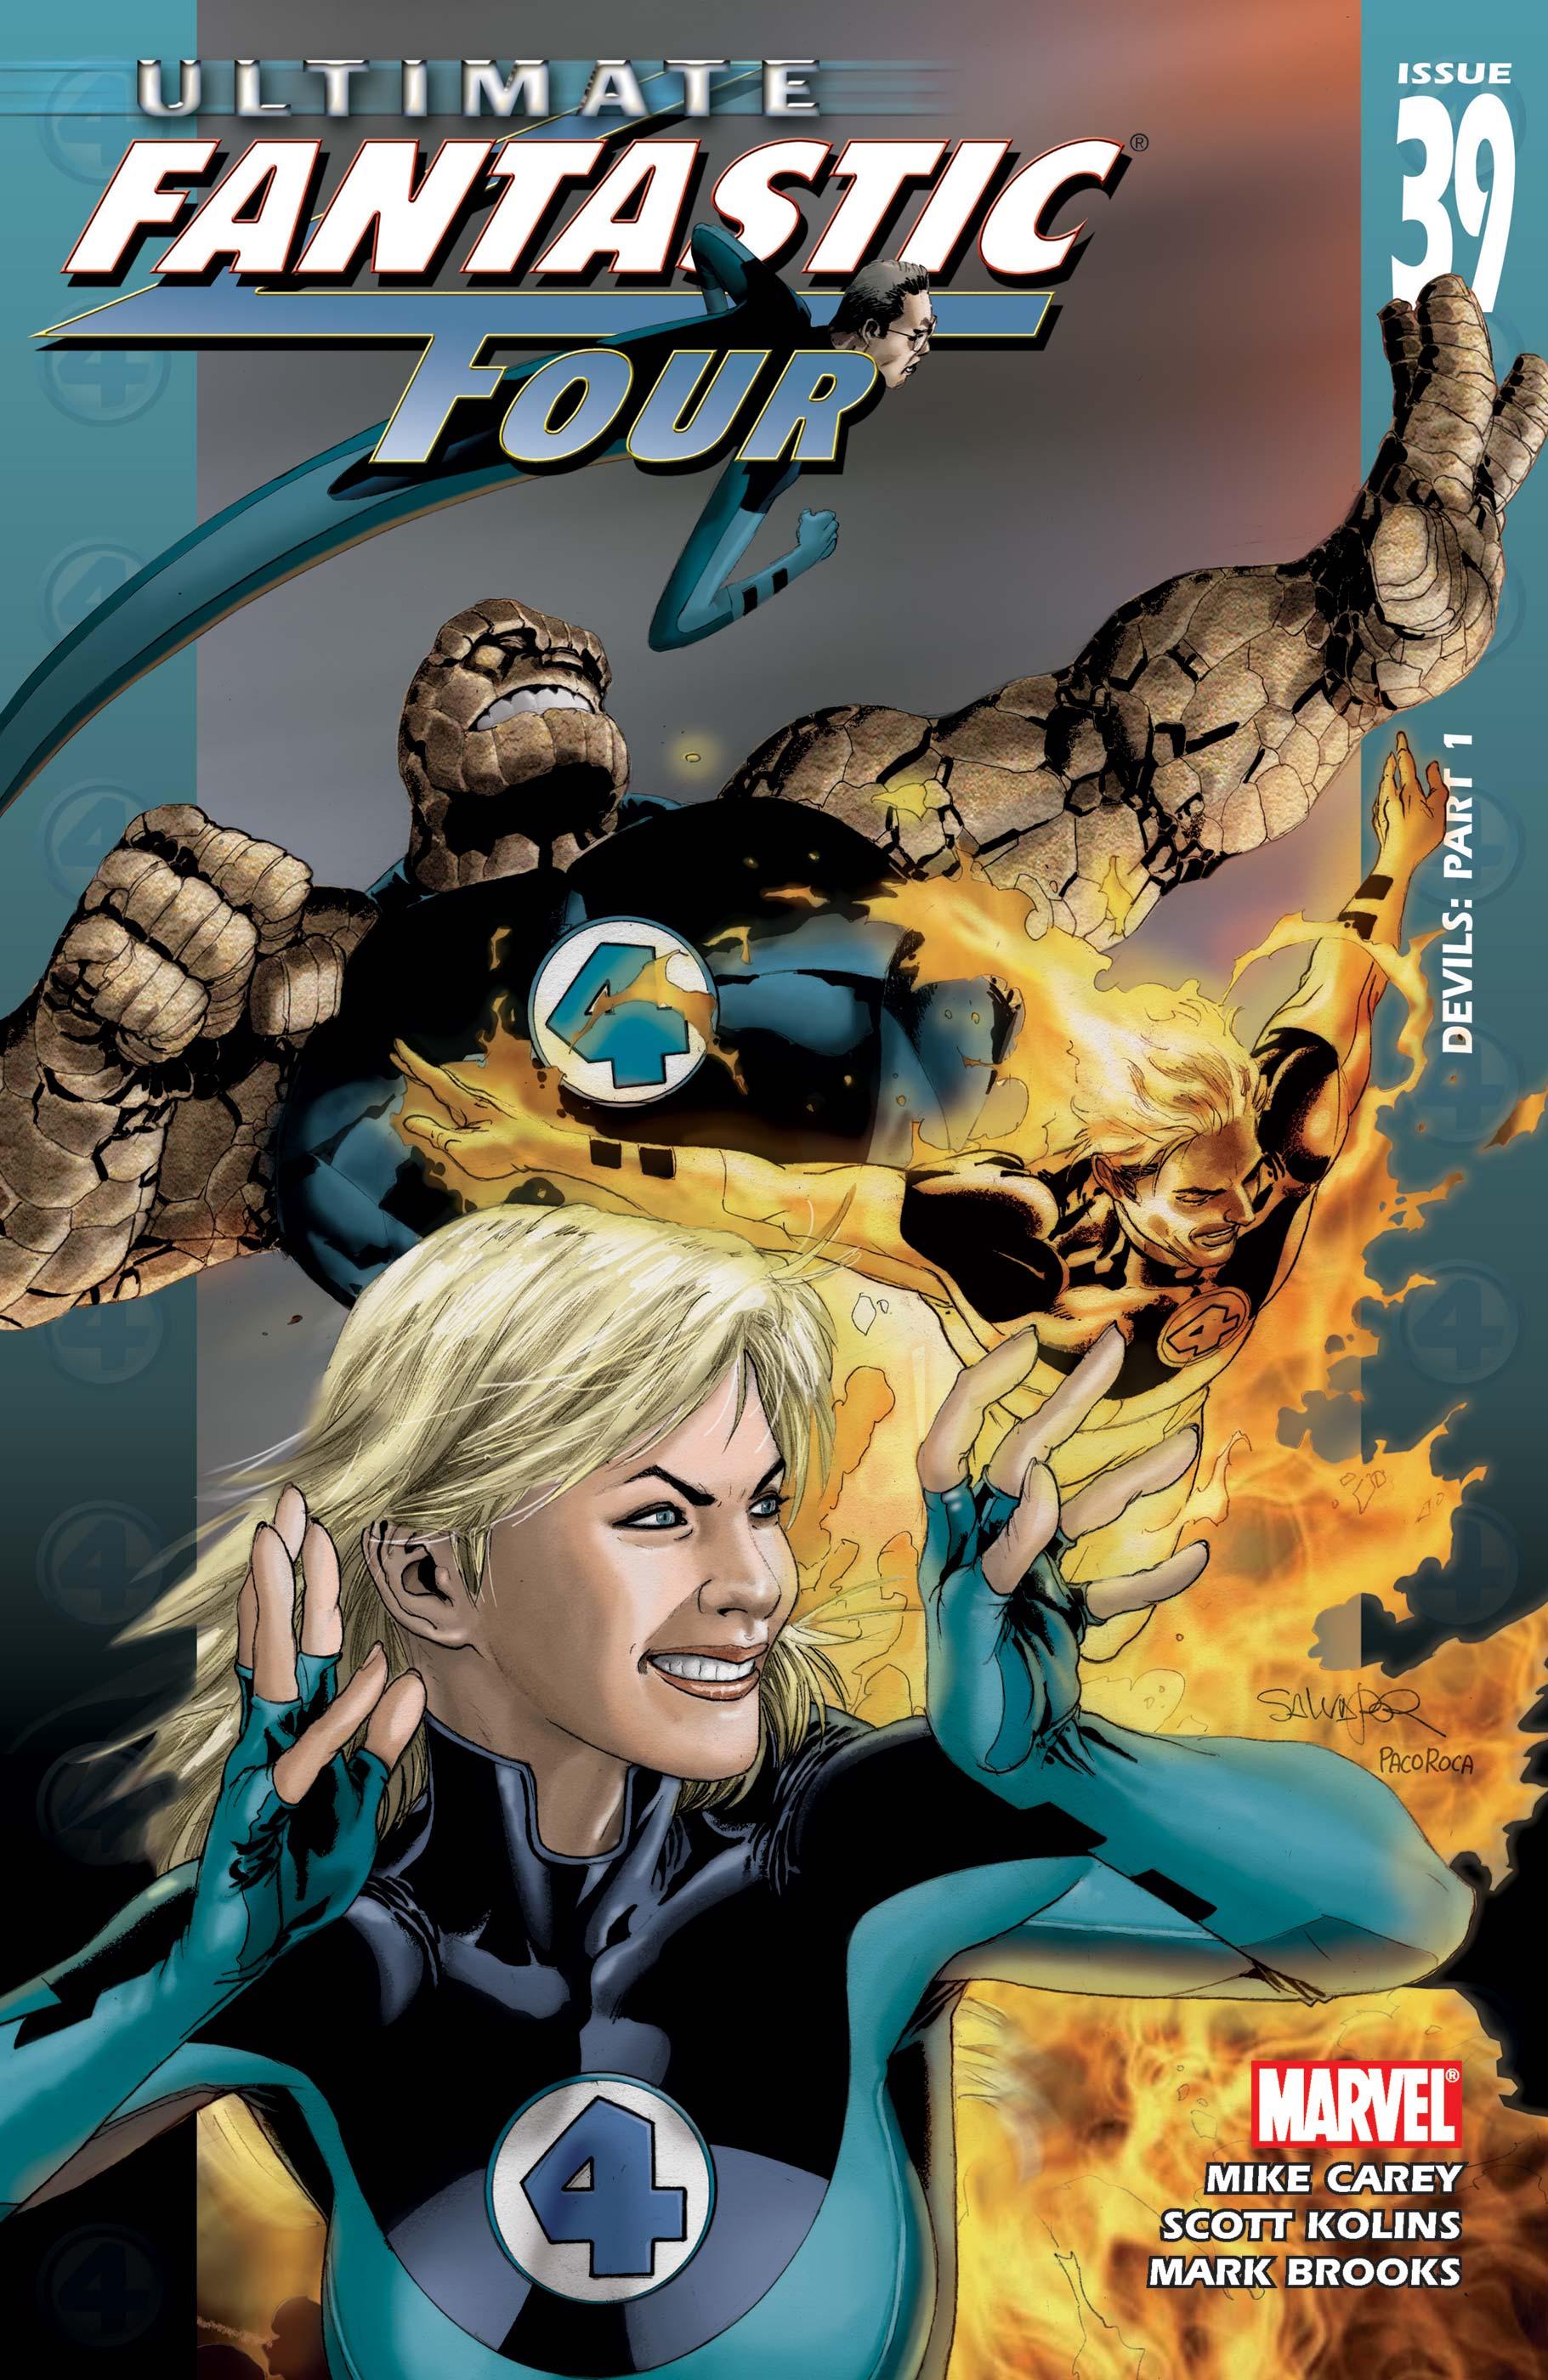 Ultimate Fantastic Four (2003) #39